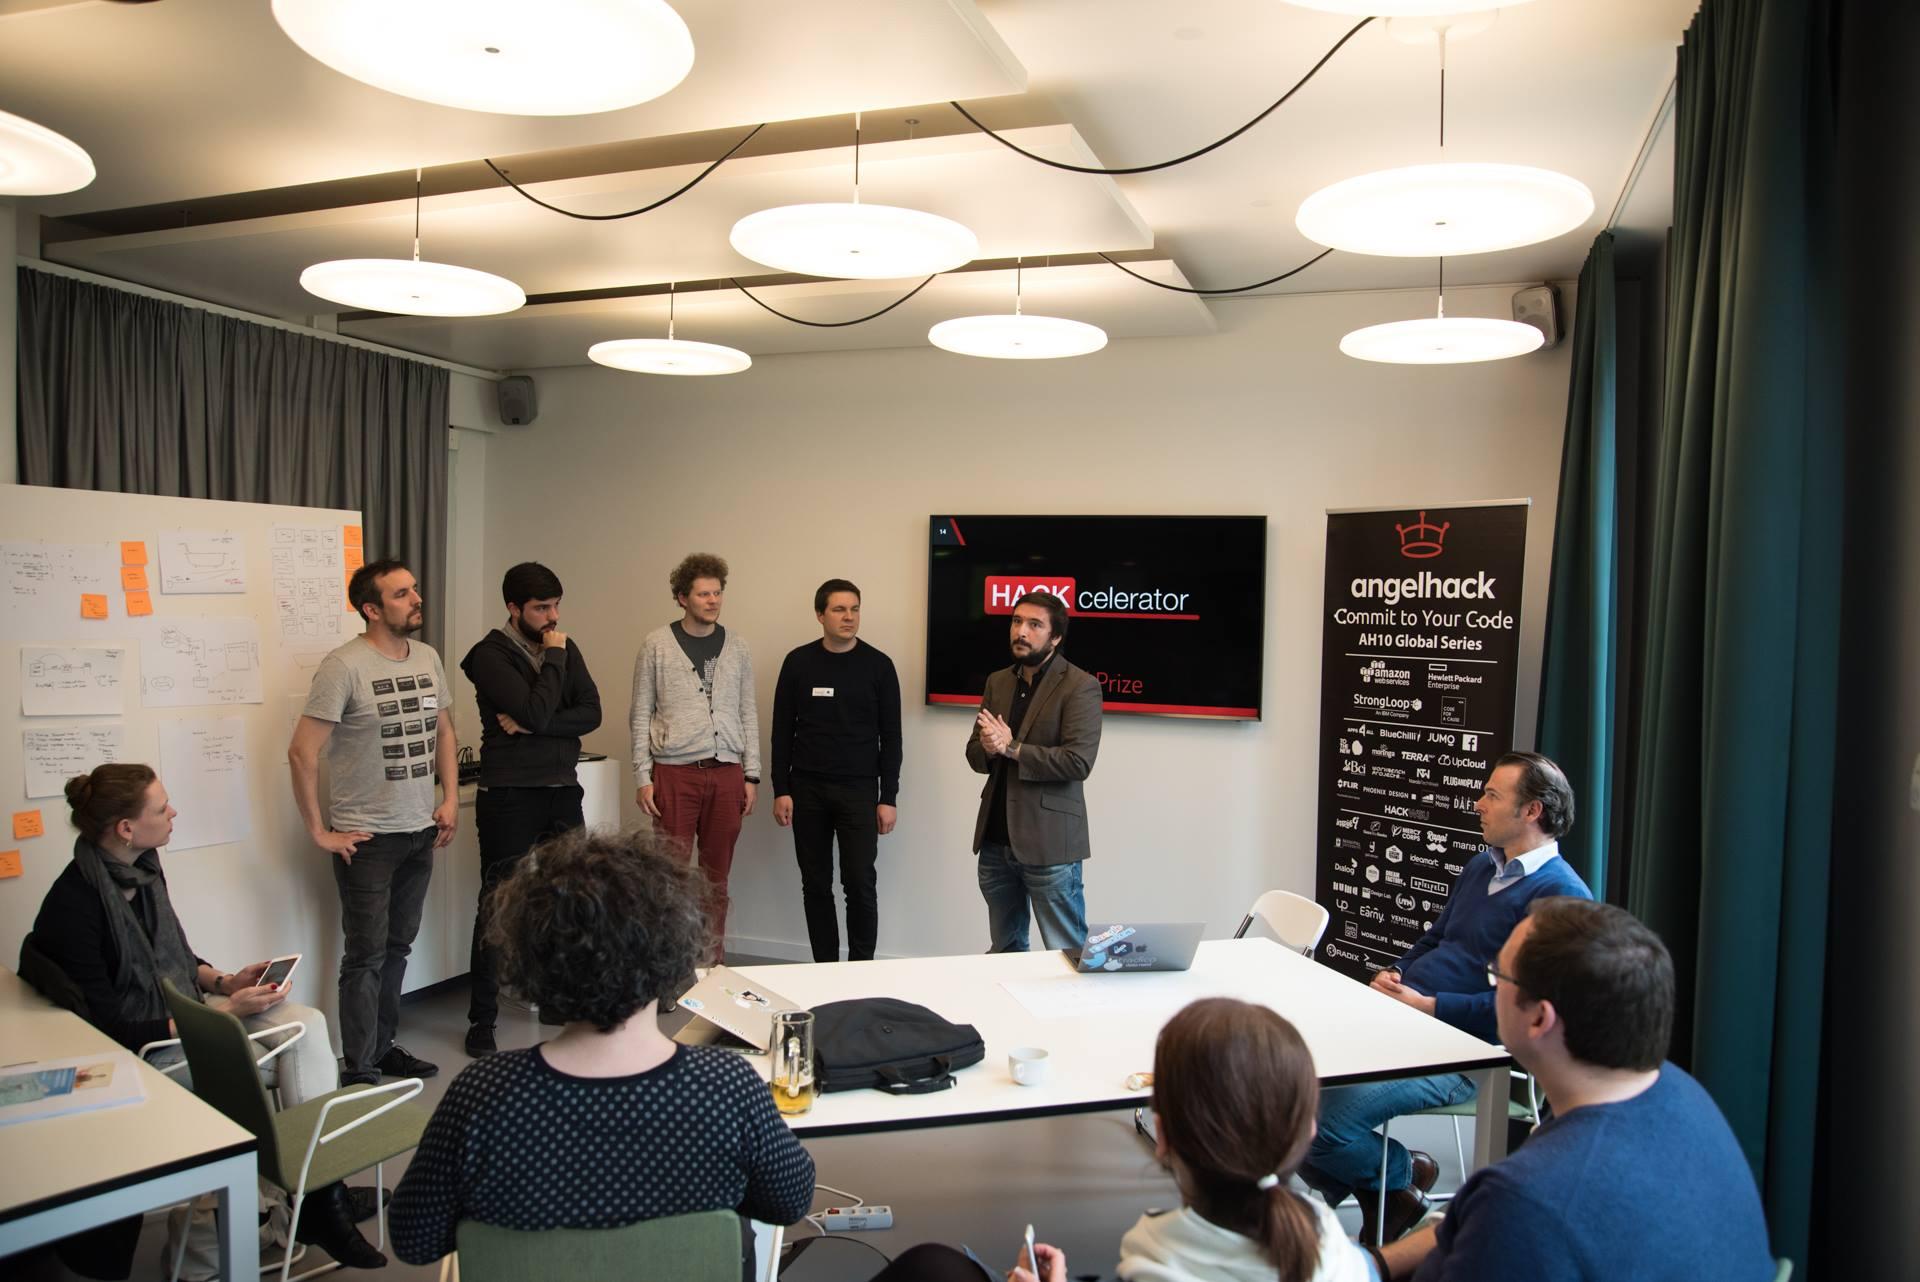 Receiving feedback on the angelhack hackathon